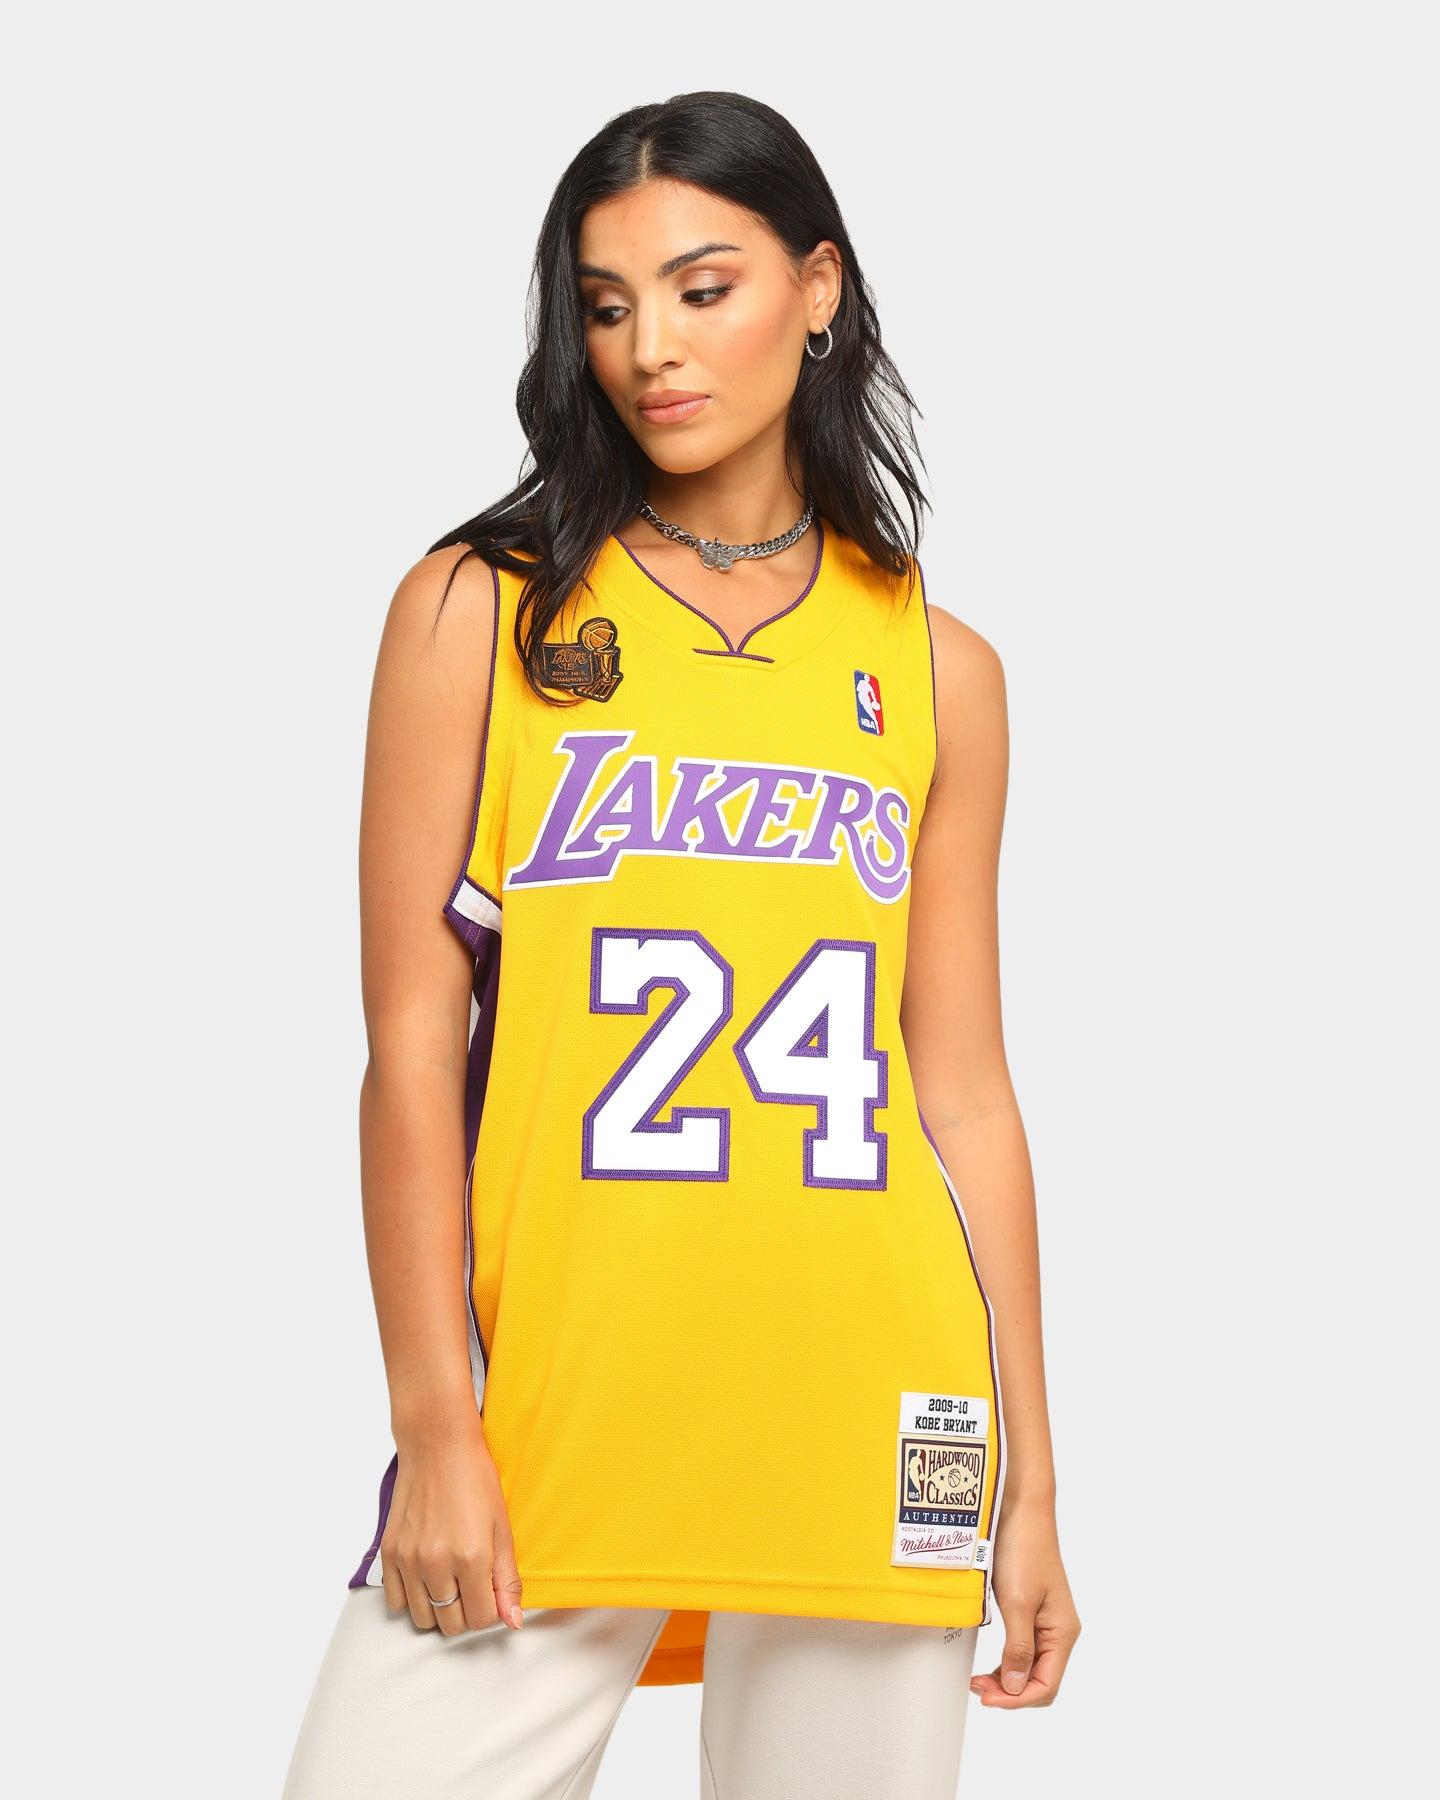 kobe bryant lakers jersey women's cheap buy online